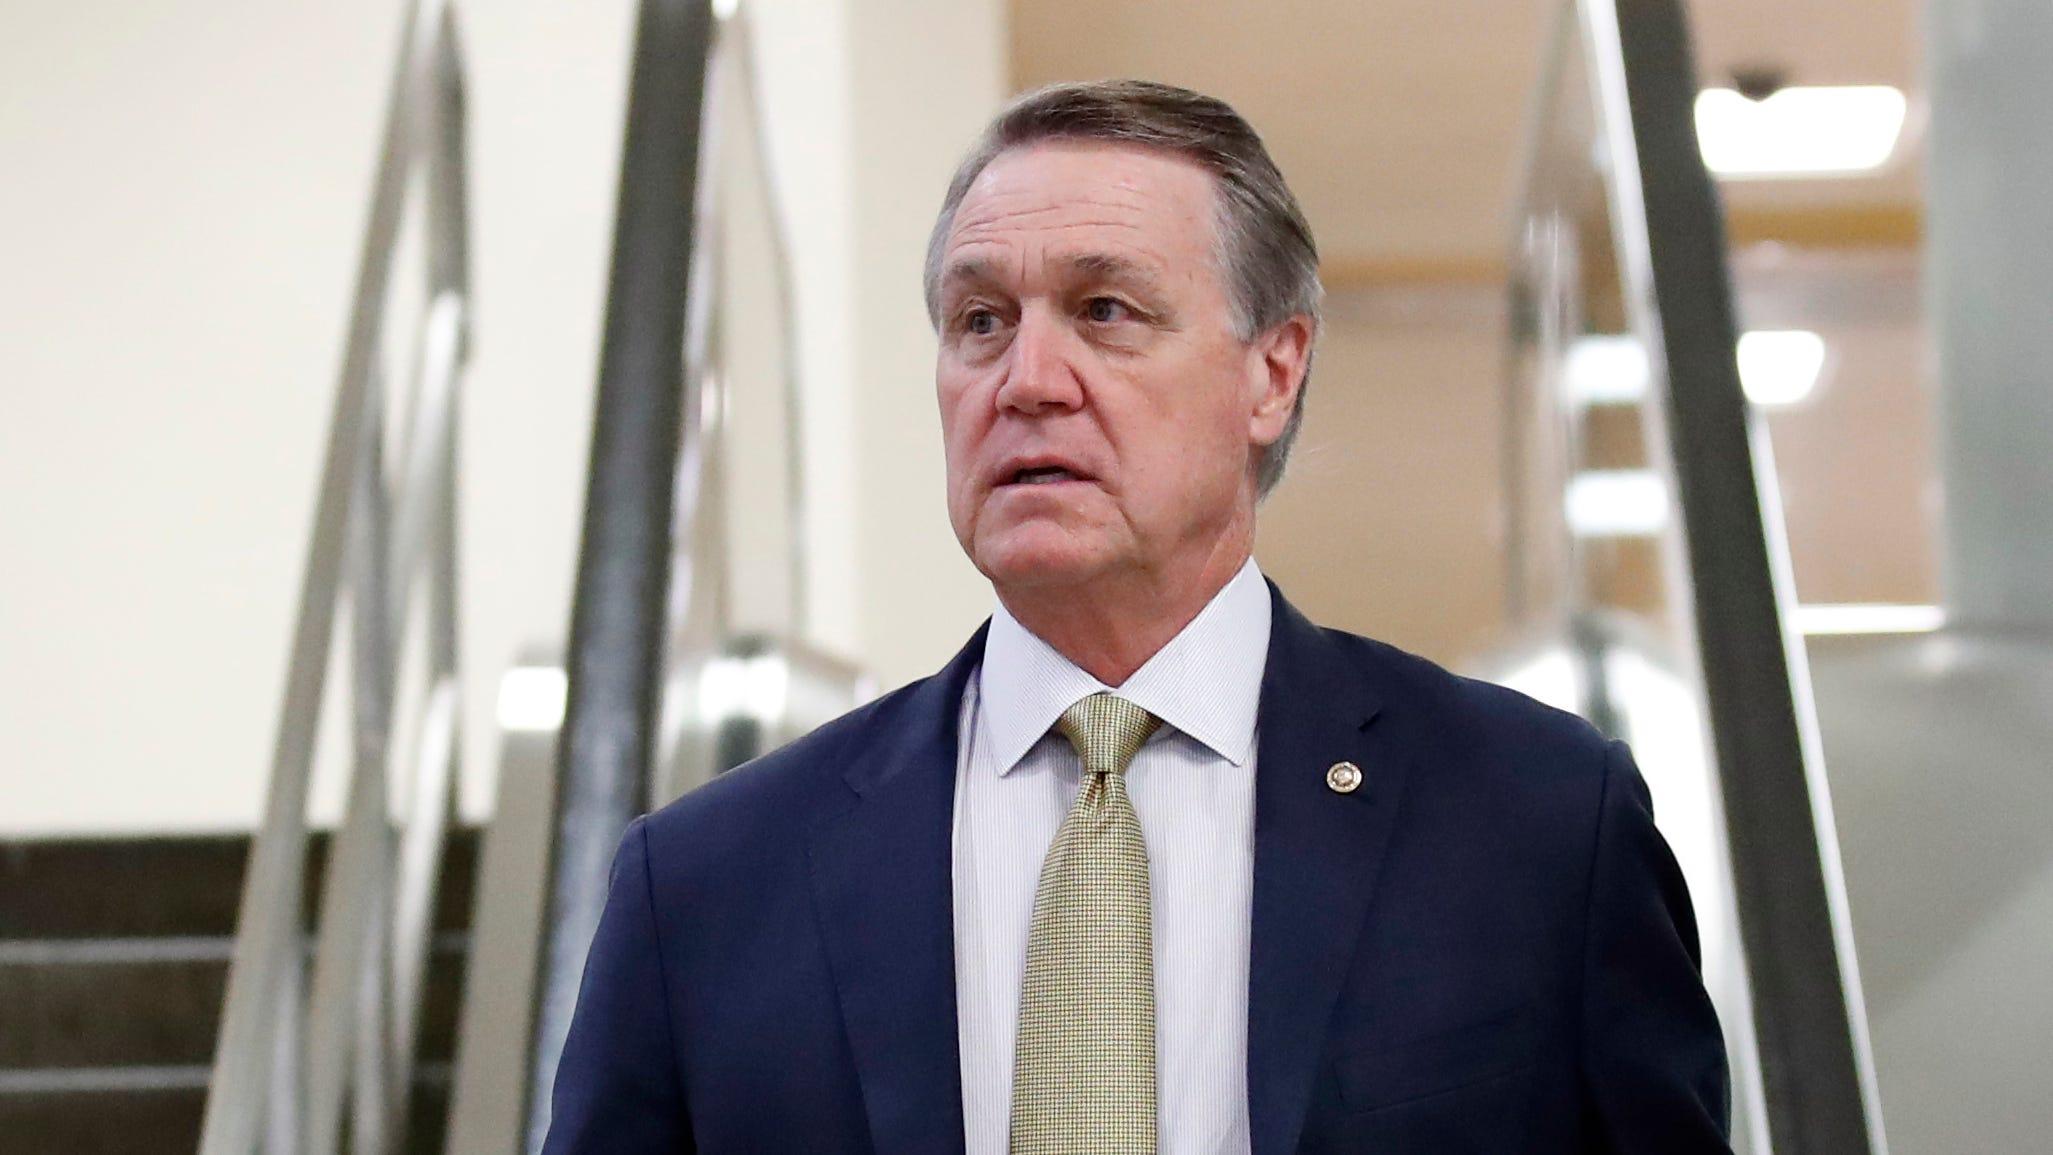 Sen. David Perdue, R-Ga., arrives on Capitol Hill, in Washington on Oct. 4, 2018.